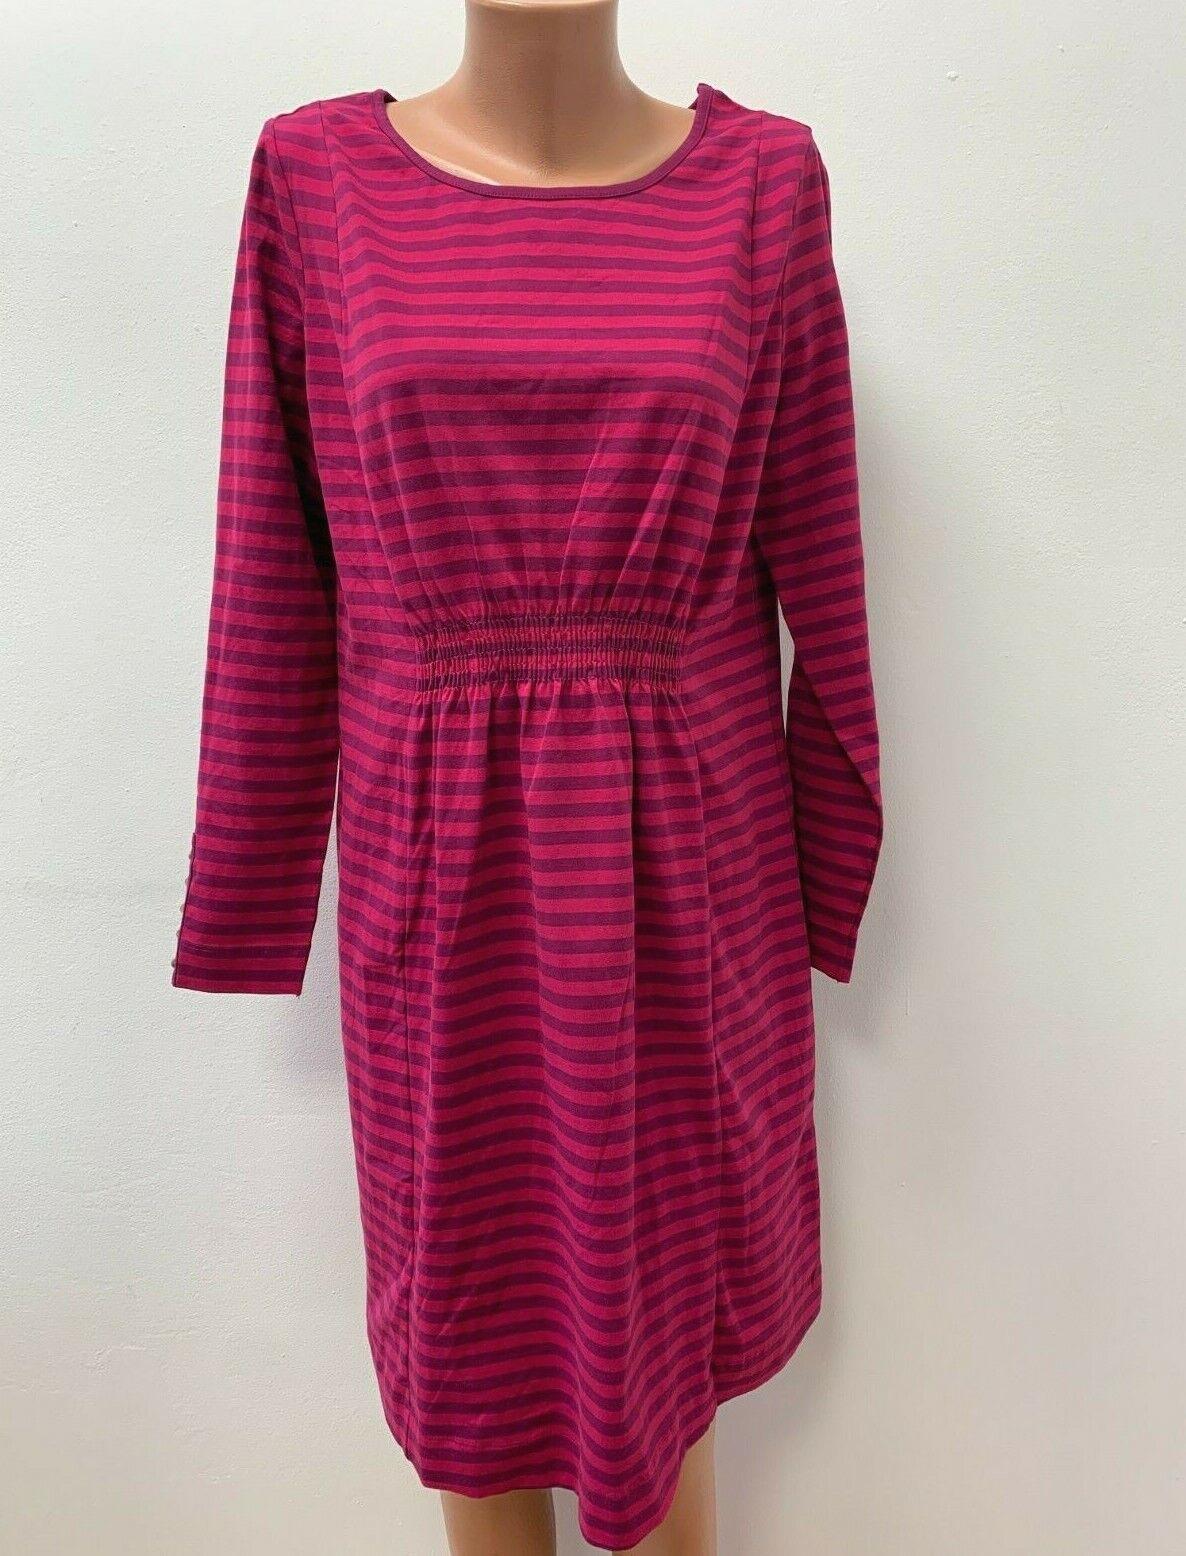 DEERBERG Gr. M / L Stretch Kleid Jersey Rosa Magenta Fuschia Gestreift langarm